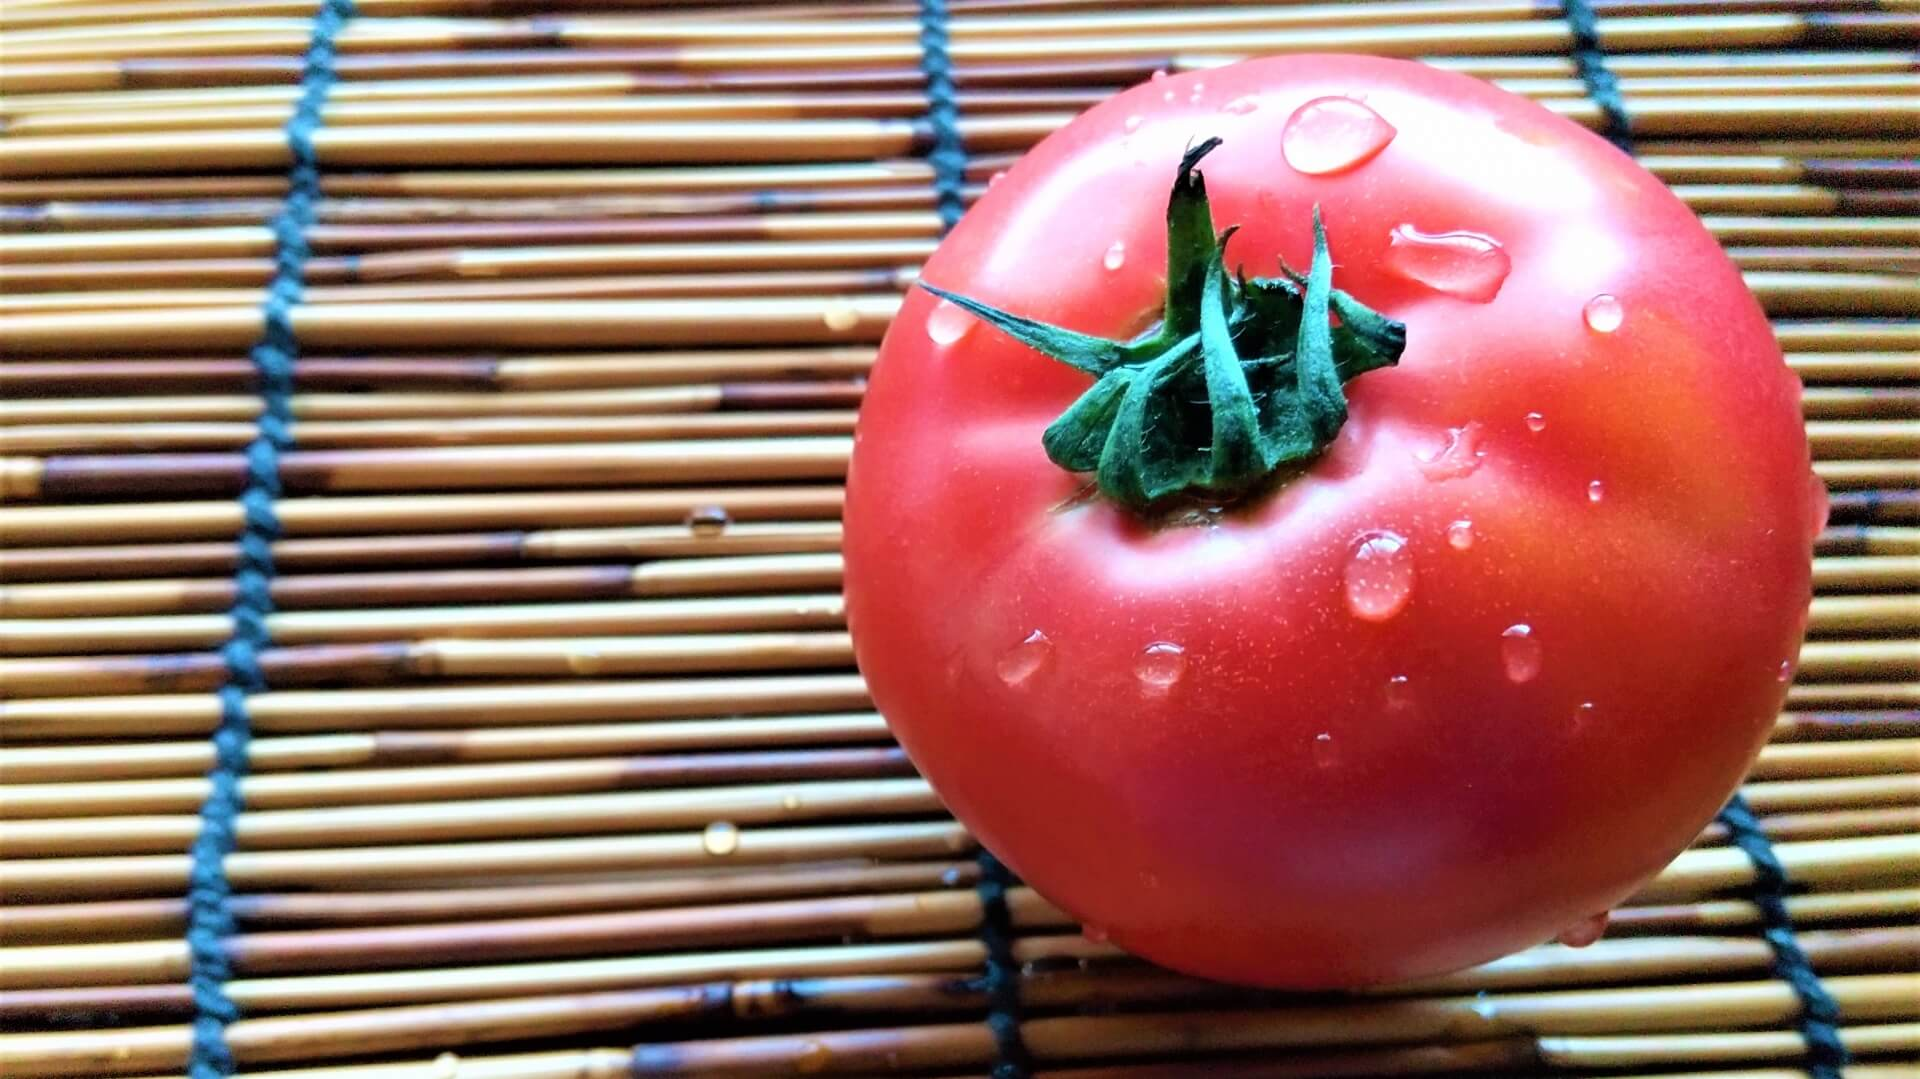 【Wellness Farm Day -はたけの日-】枝豆・トマト収穫体験@ひらかた独歩ふぁーむ